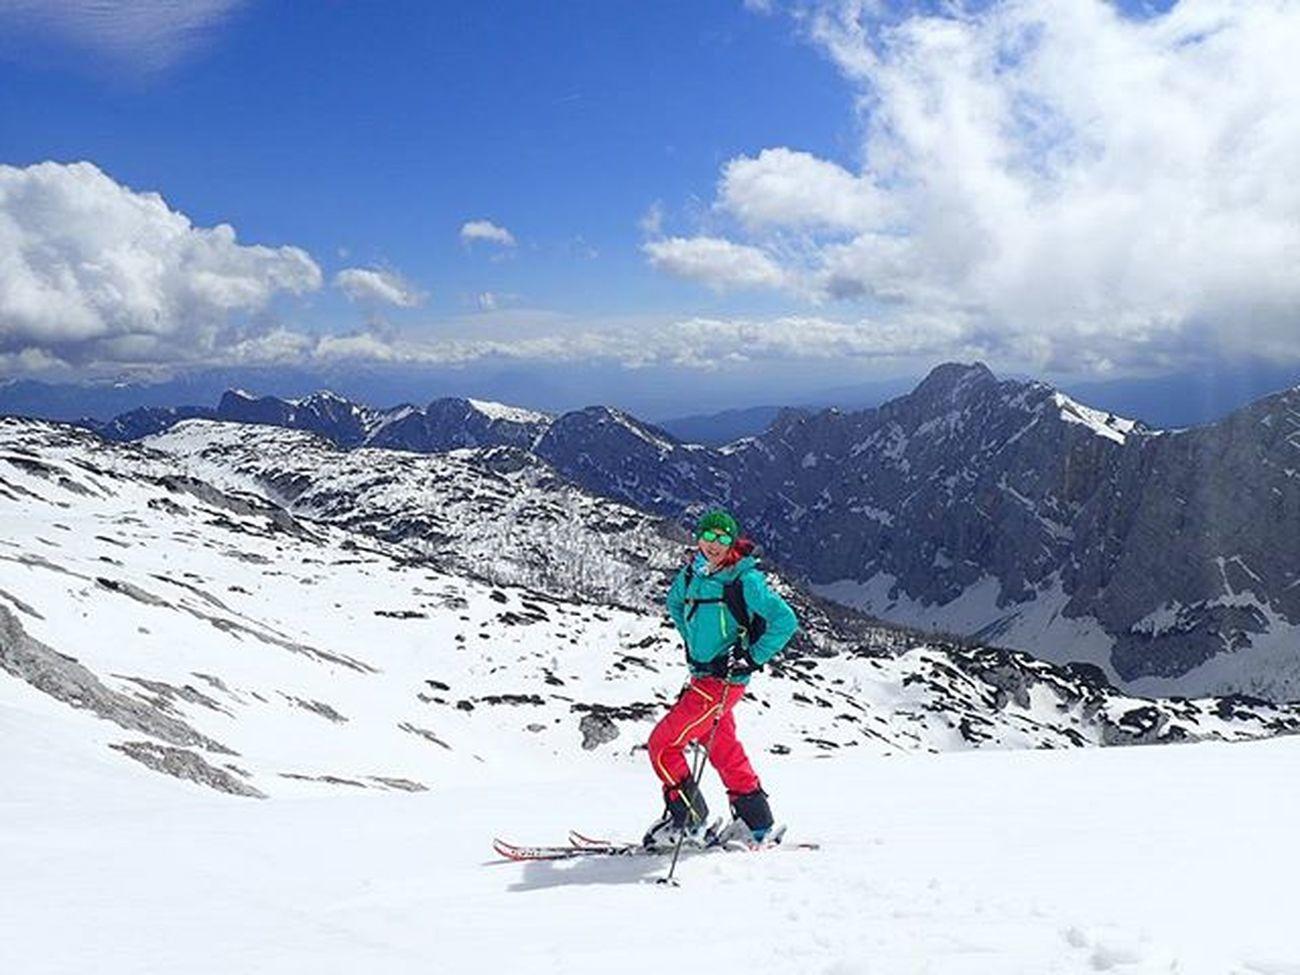 😍😍😍mY woRLd is aBoVe 2500m➡awSoMe daY😍😍😍 Kredarica Julianalps Julijskealpe Triglavnationalpark IfeelsLOVEnia Kampadanes Razmerevgorah Igslovenia Geoslovenija Thisisslovenia Backcountryskiing Visitslovenia Norrona Sportaddict Ig_neverstopexploring Outdoorwomen Badassisbeautiful Lifeisgood Ridewithaview Iloveskiing Springskiing Ig_sharepoint Mountaingirls Loves_mountains Montagne_my_life loves_slovenia whataday